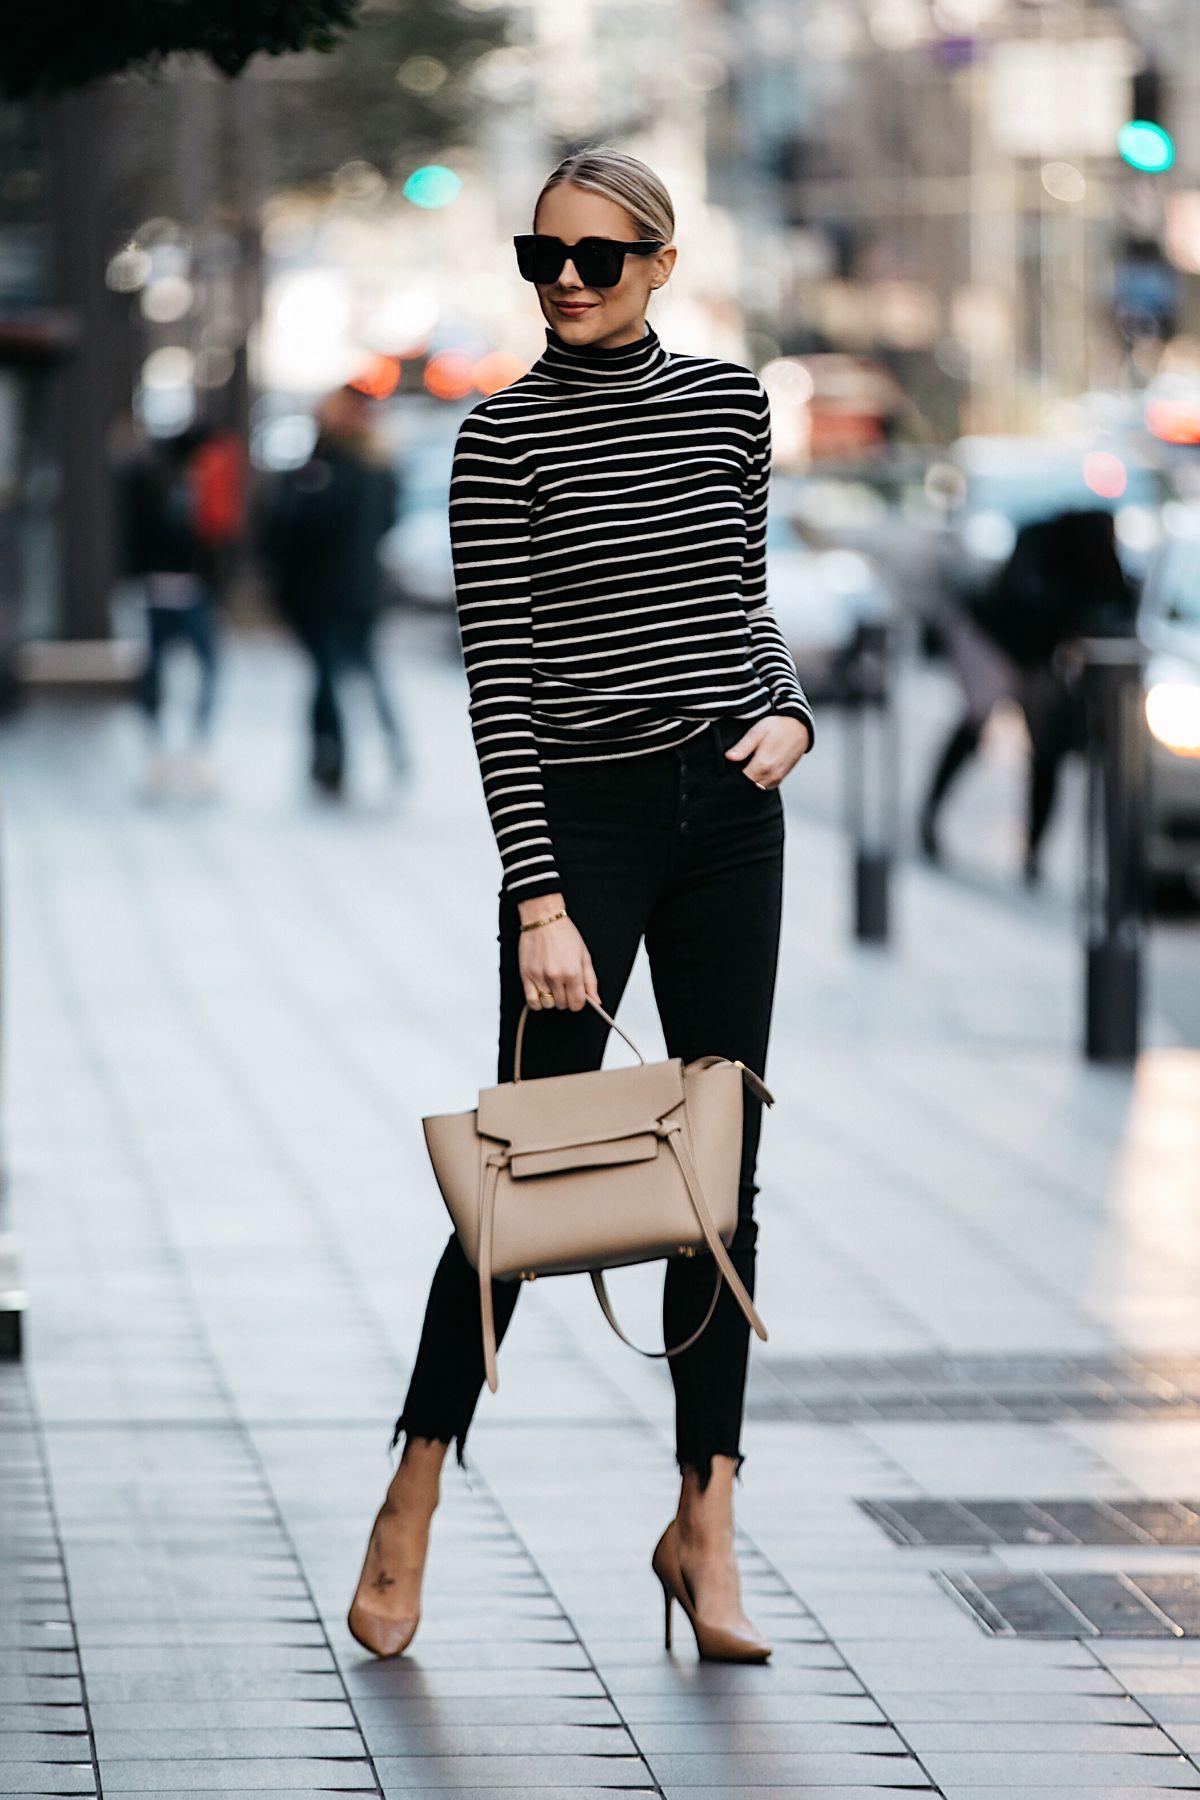 00fbd0b86 Blonde Woman Wearing Nordstrom Black White Striped Turtleneck Sweater Black  Skinny Jeans Nude Pumps Outfit Celine Mini Belt Bag Fashion Jackson Dallas  ...